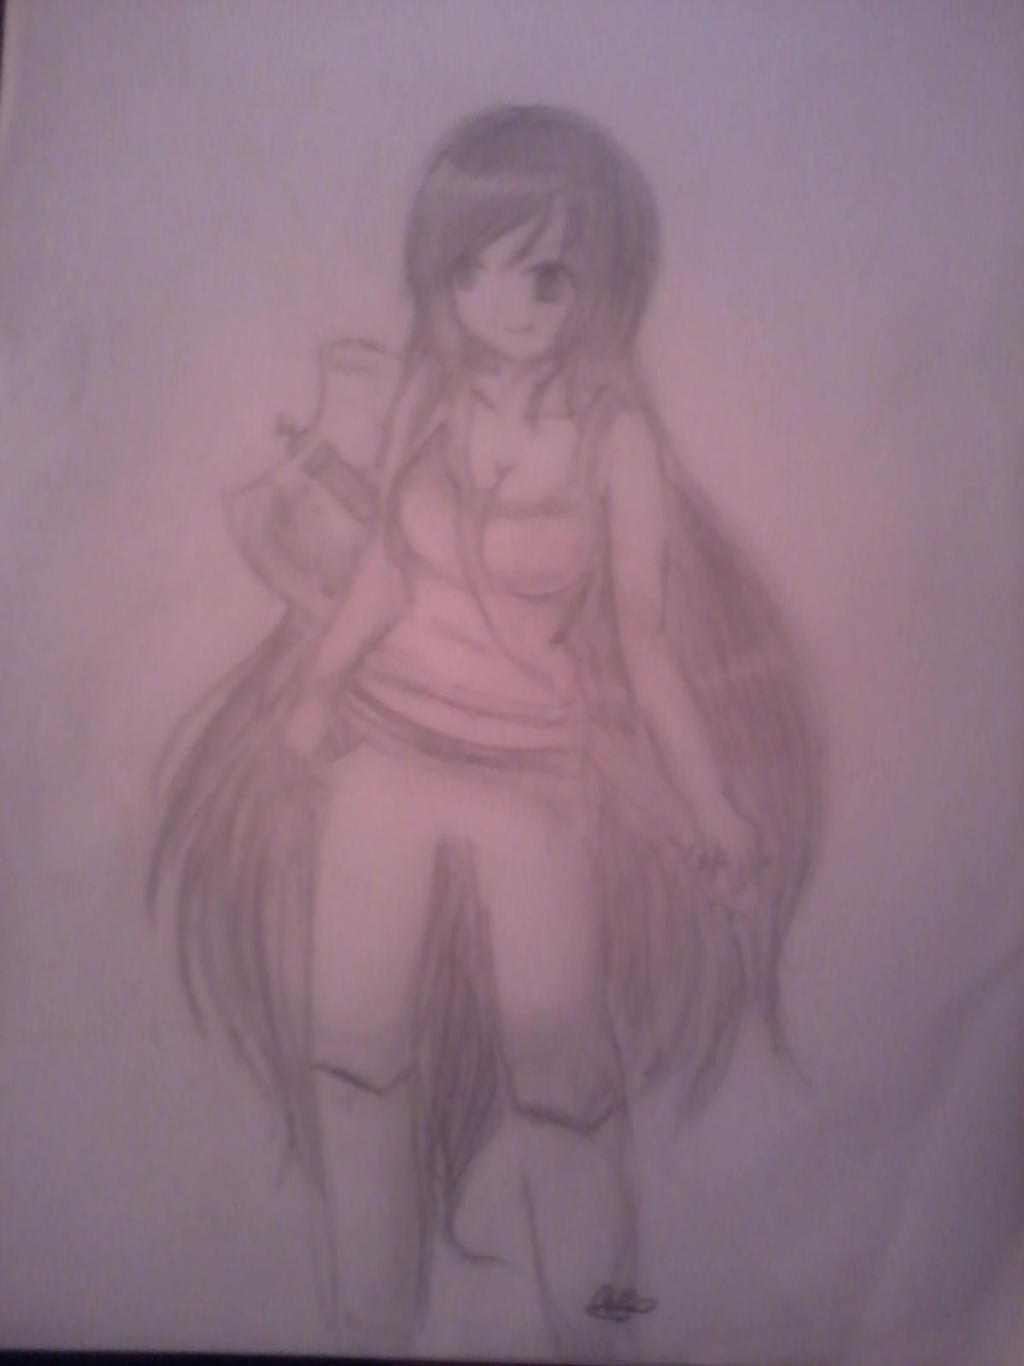 Marcy(Version Anime) by AniiYMackaFiolee